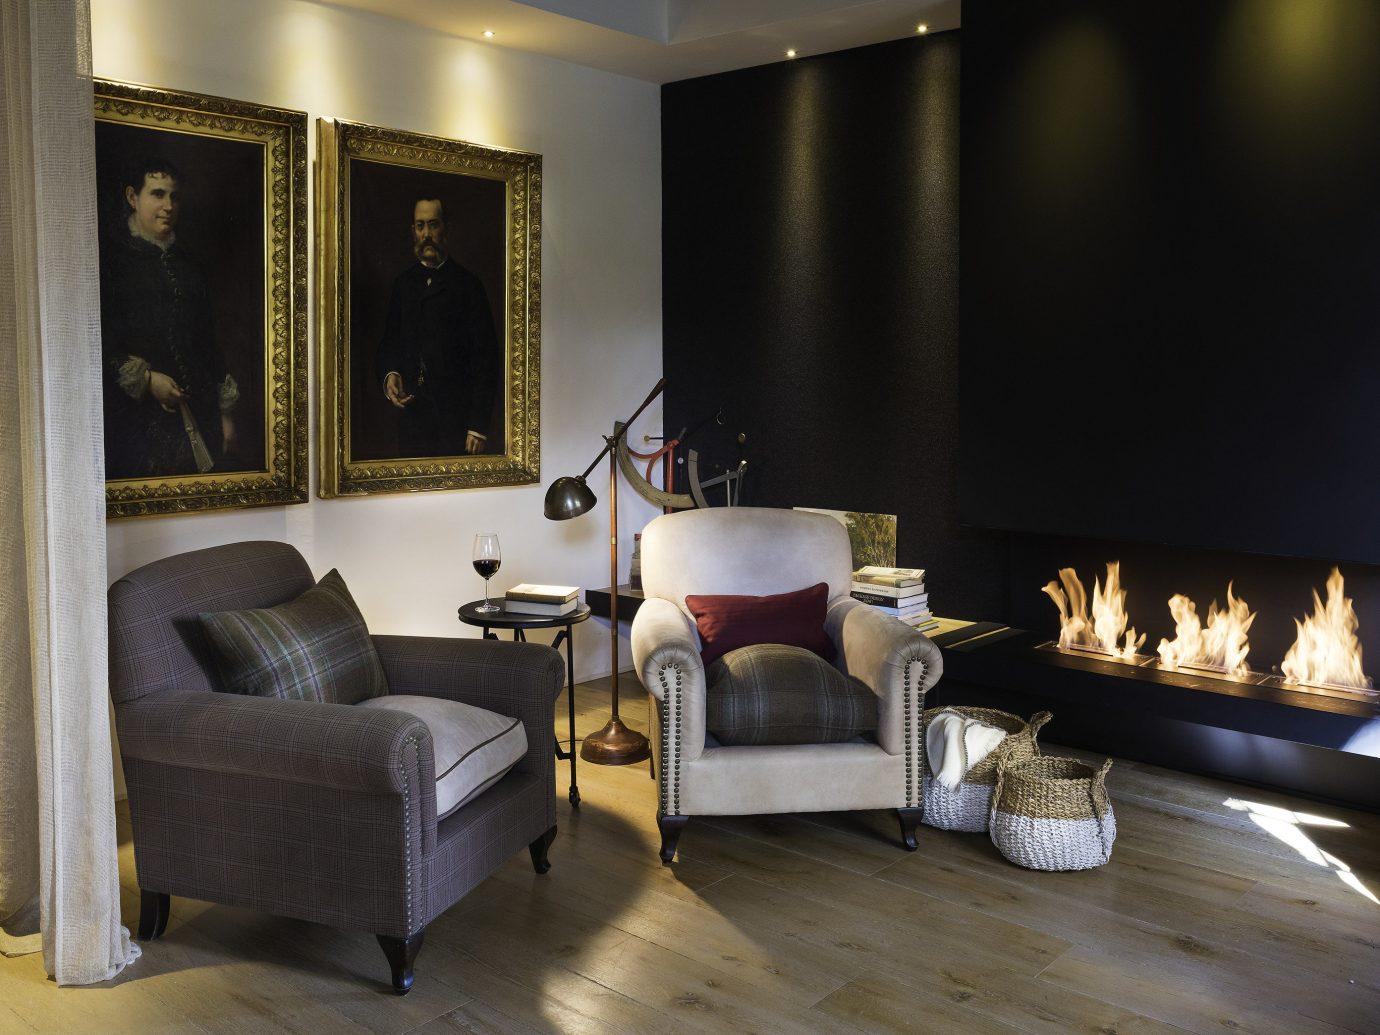 Hotels indoor floor Living wall room property living room furniture interior design home estate Suite Design flooring area